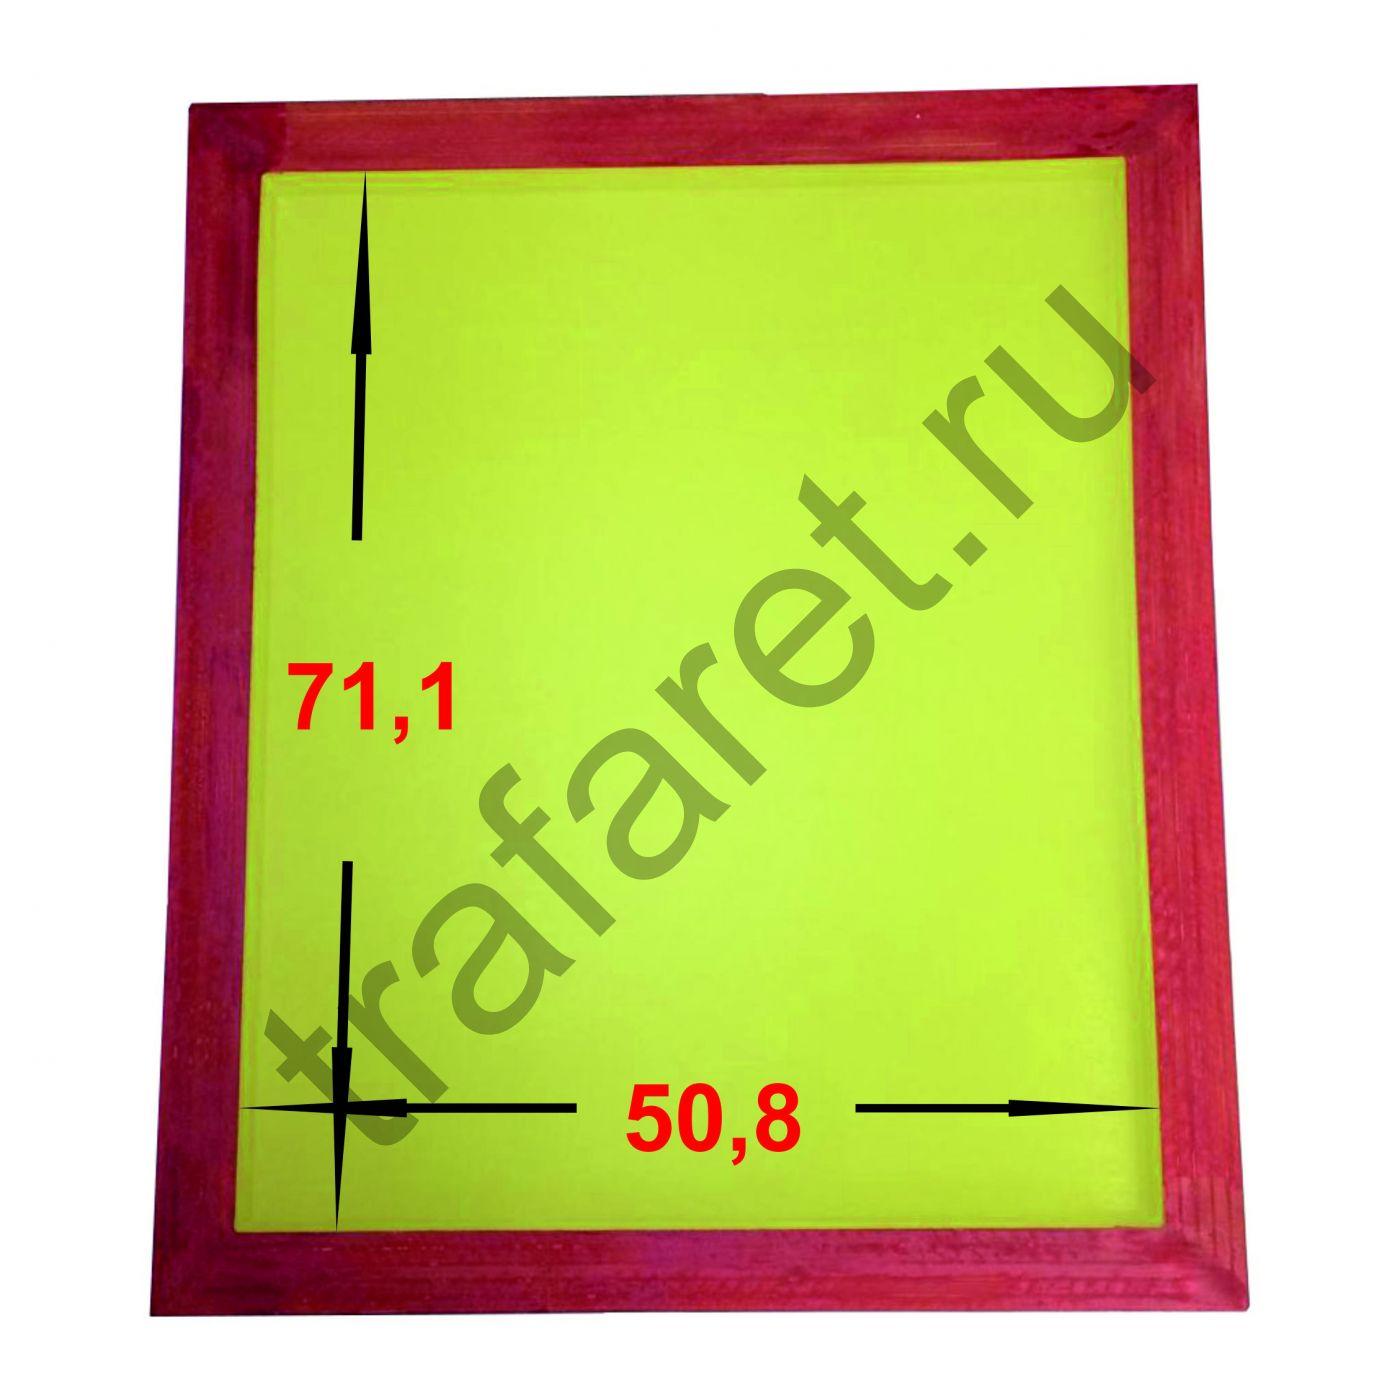 Рама 50,8х71 см с сеткой от 16/200 до 120/34 (внешн. размер 584х786 мм, профиль 38х38х1,8 мм